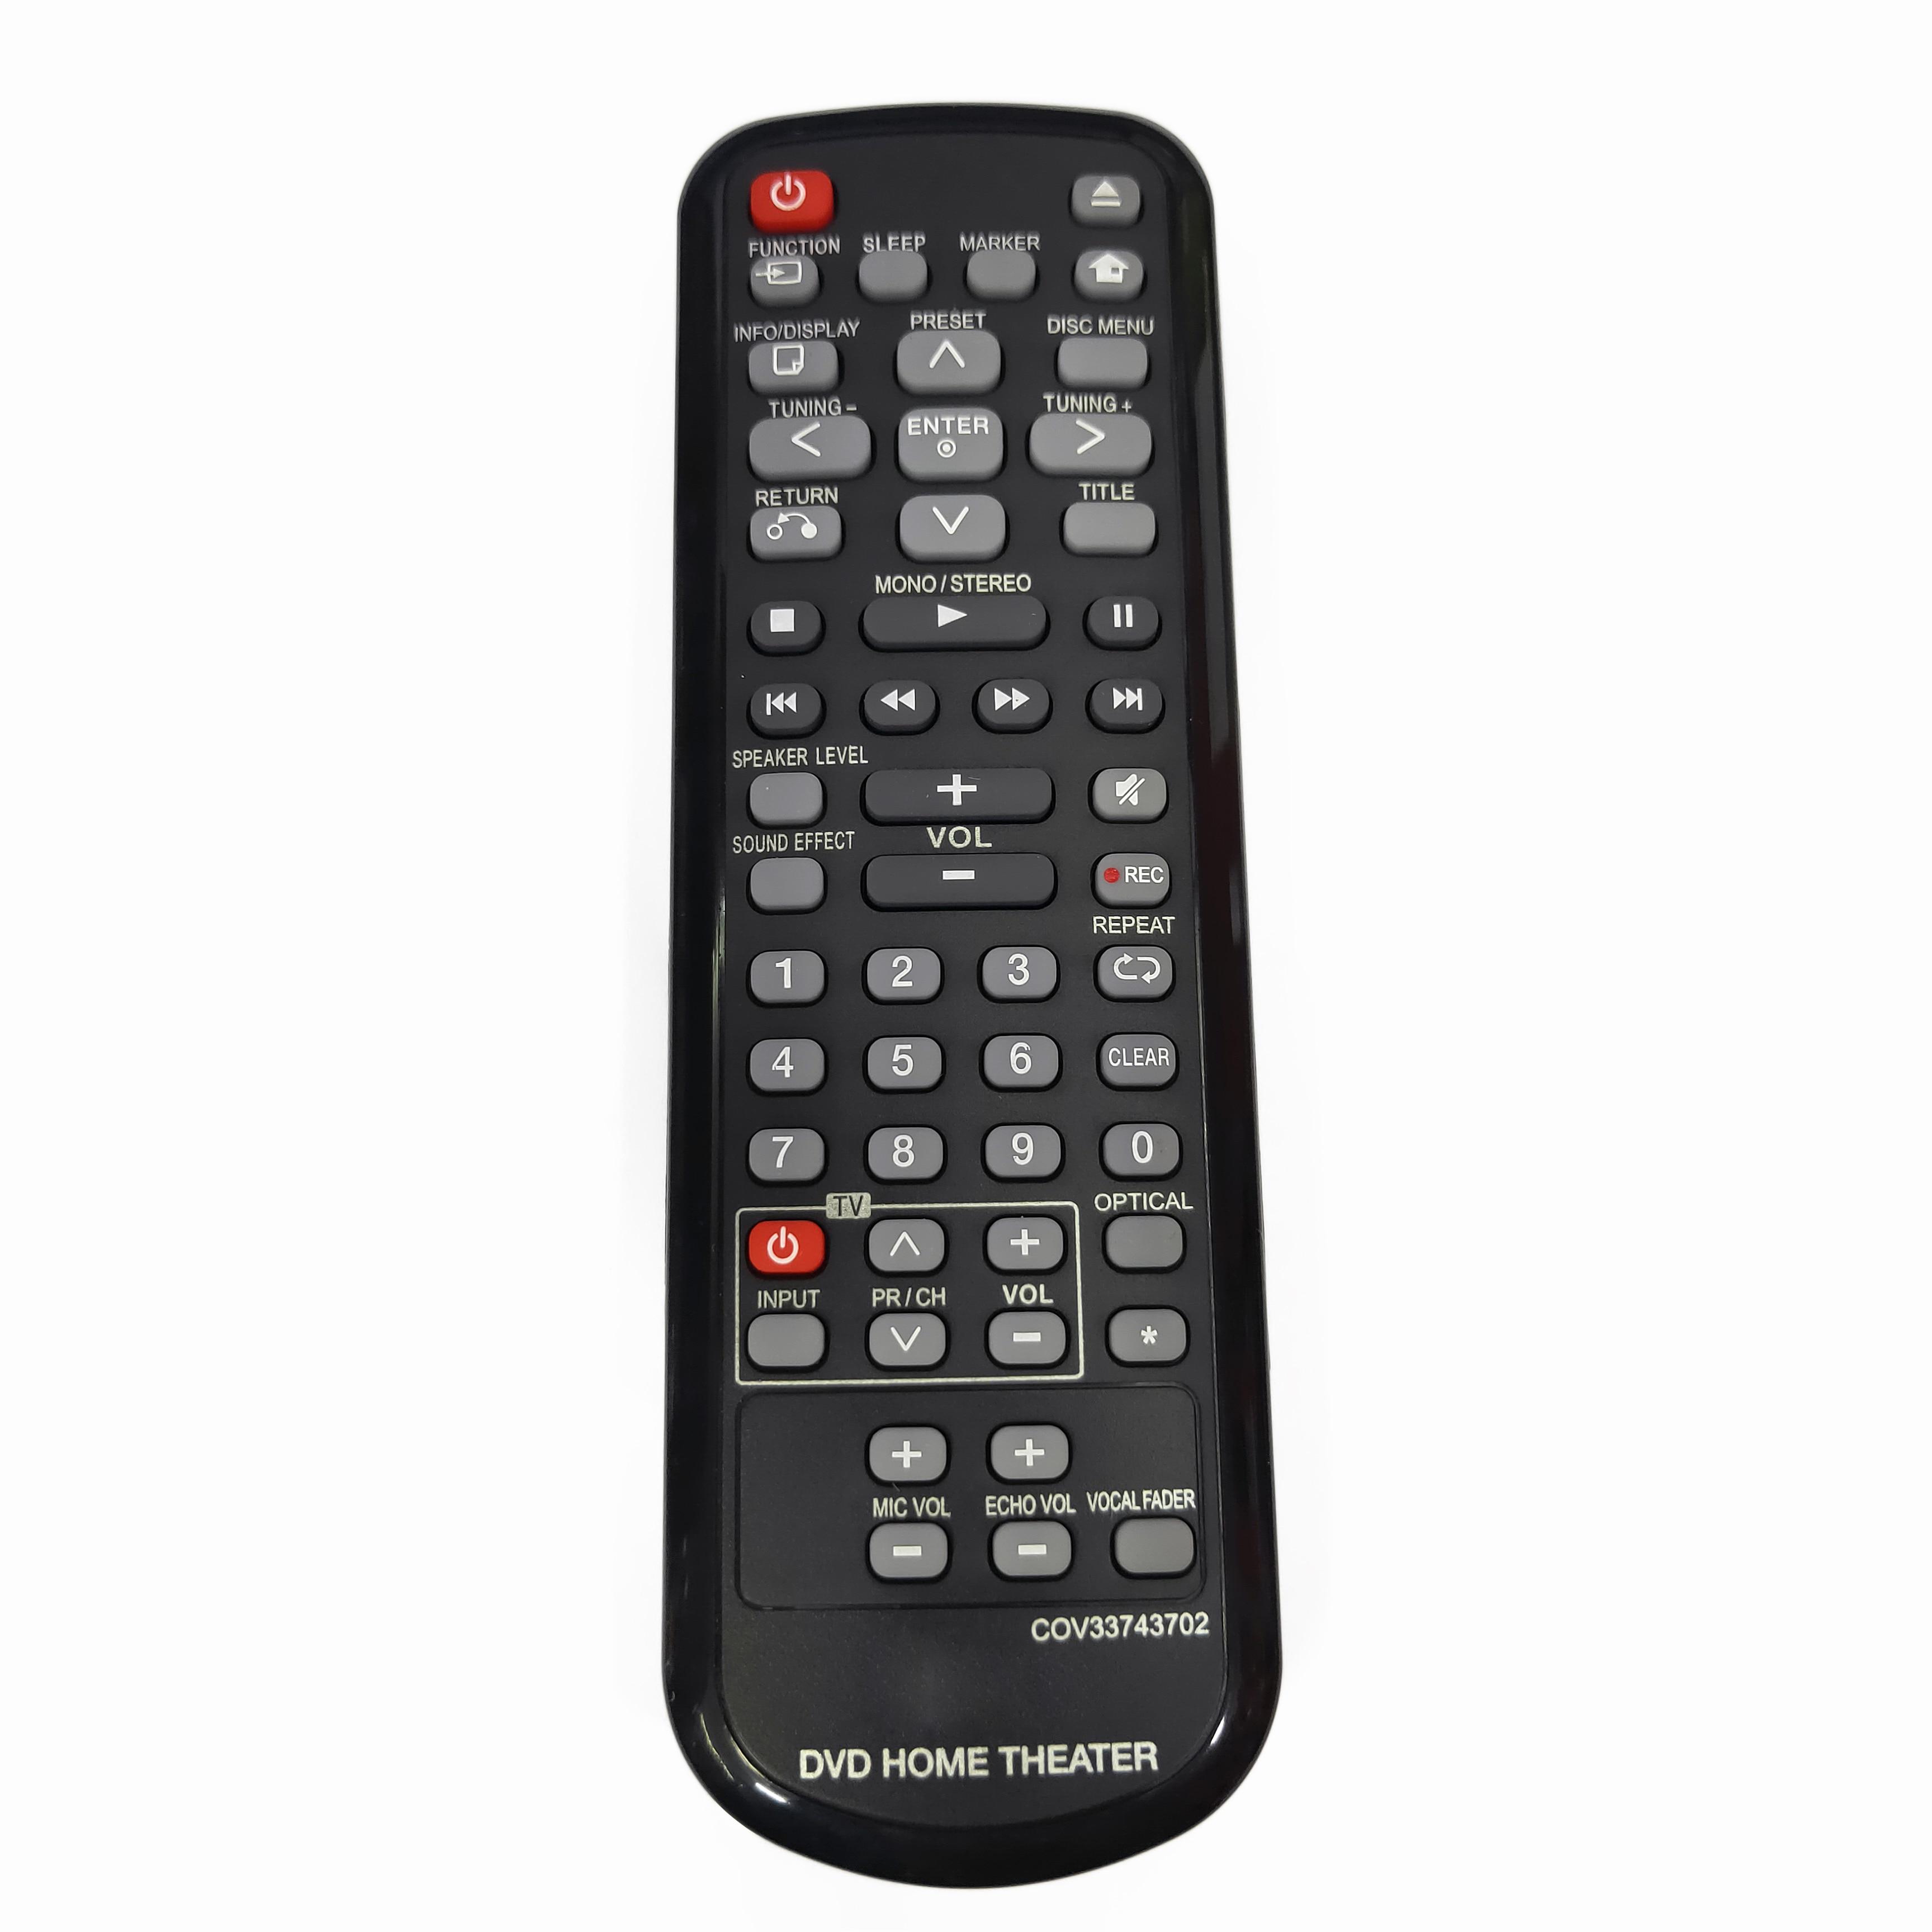 NEW Original COV33743702 for LG DVD HOME THEATER Remote control Fernbedienung